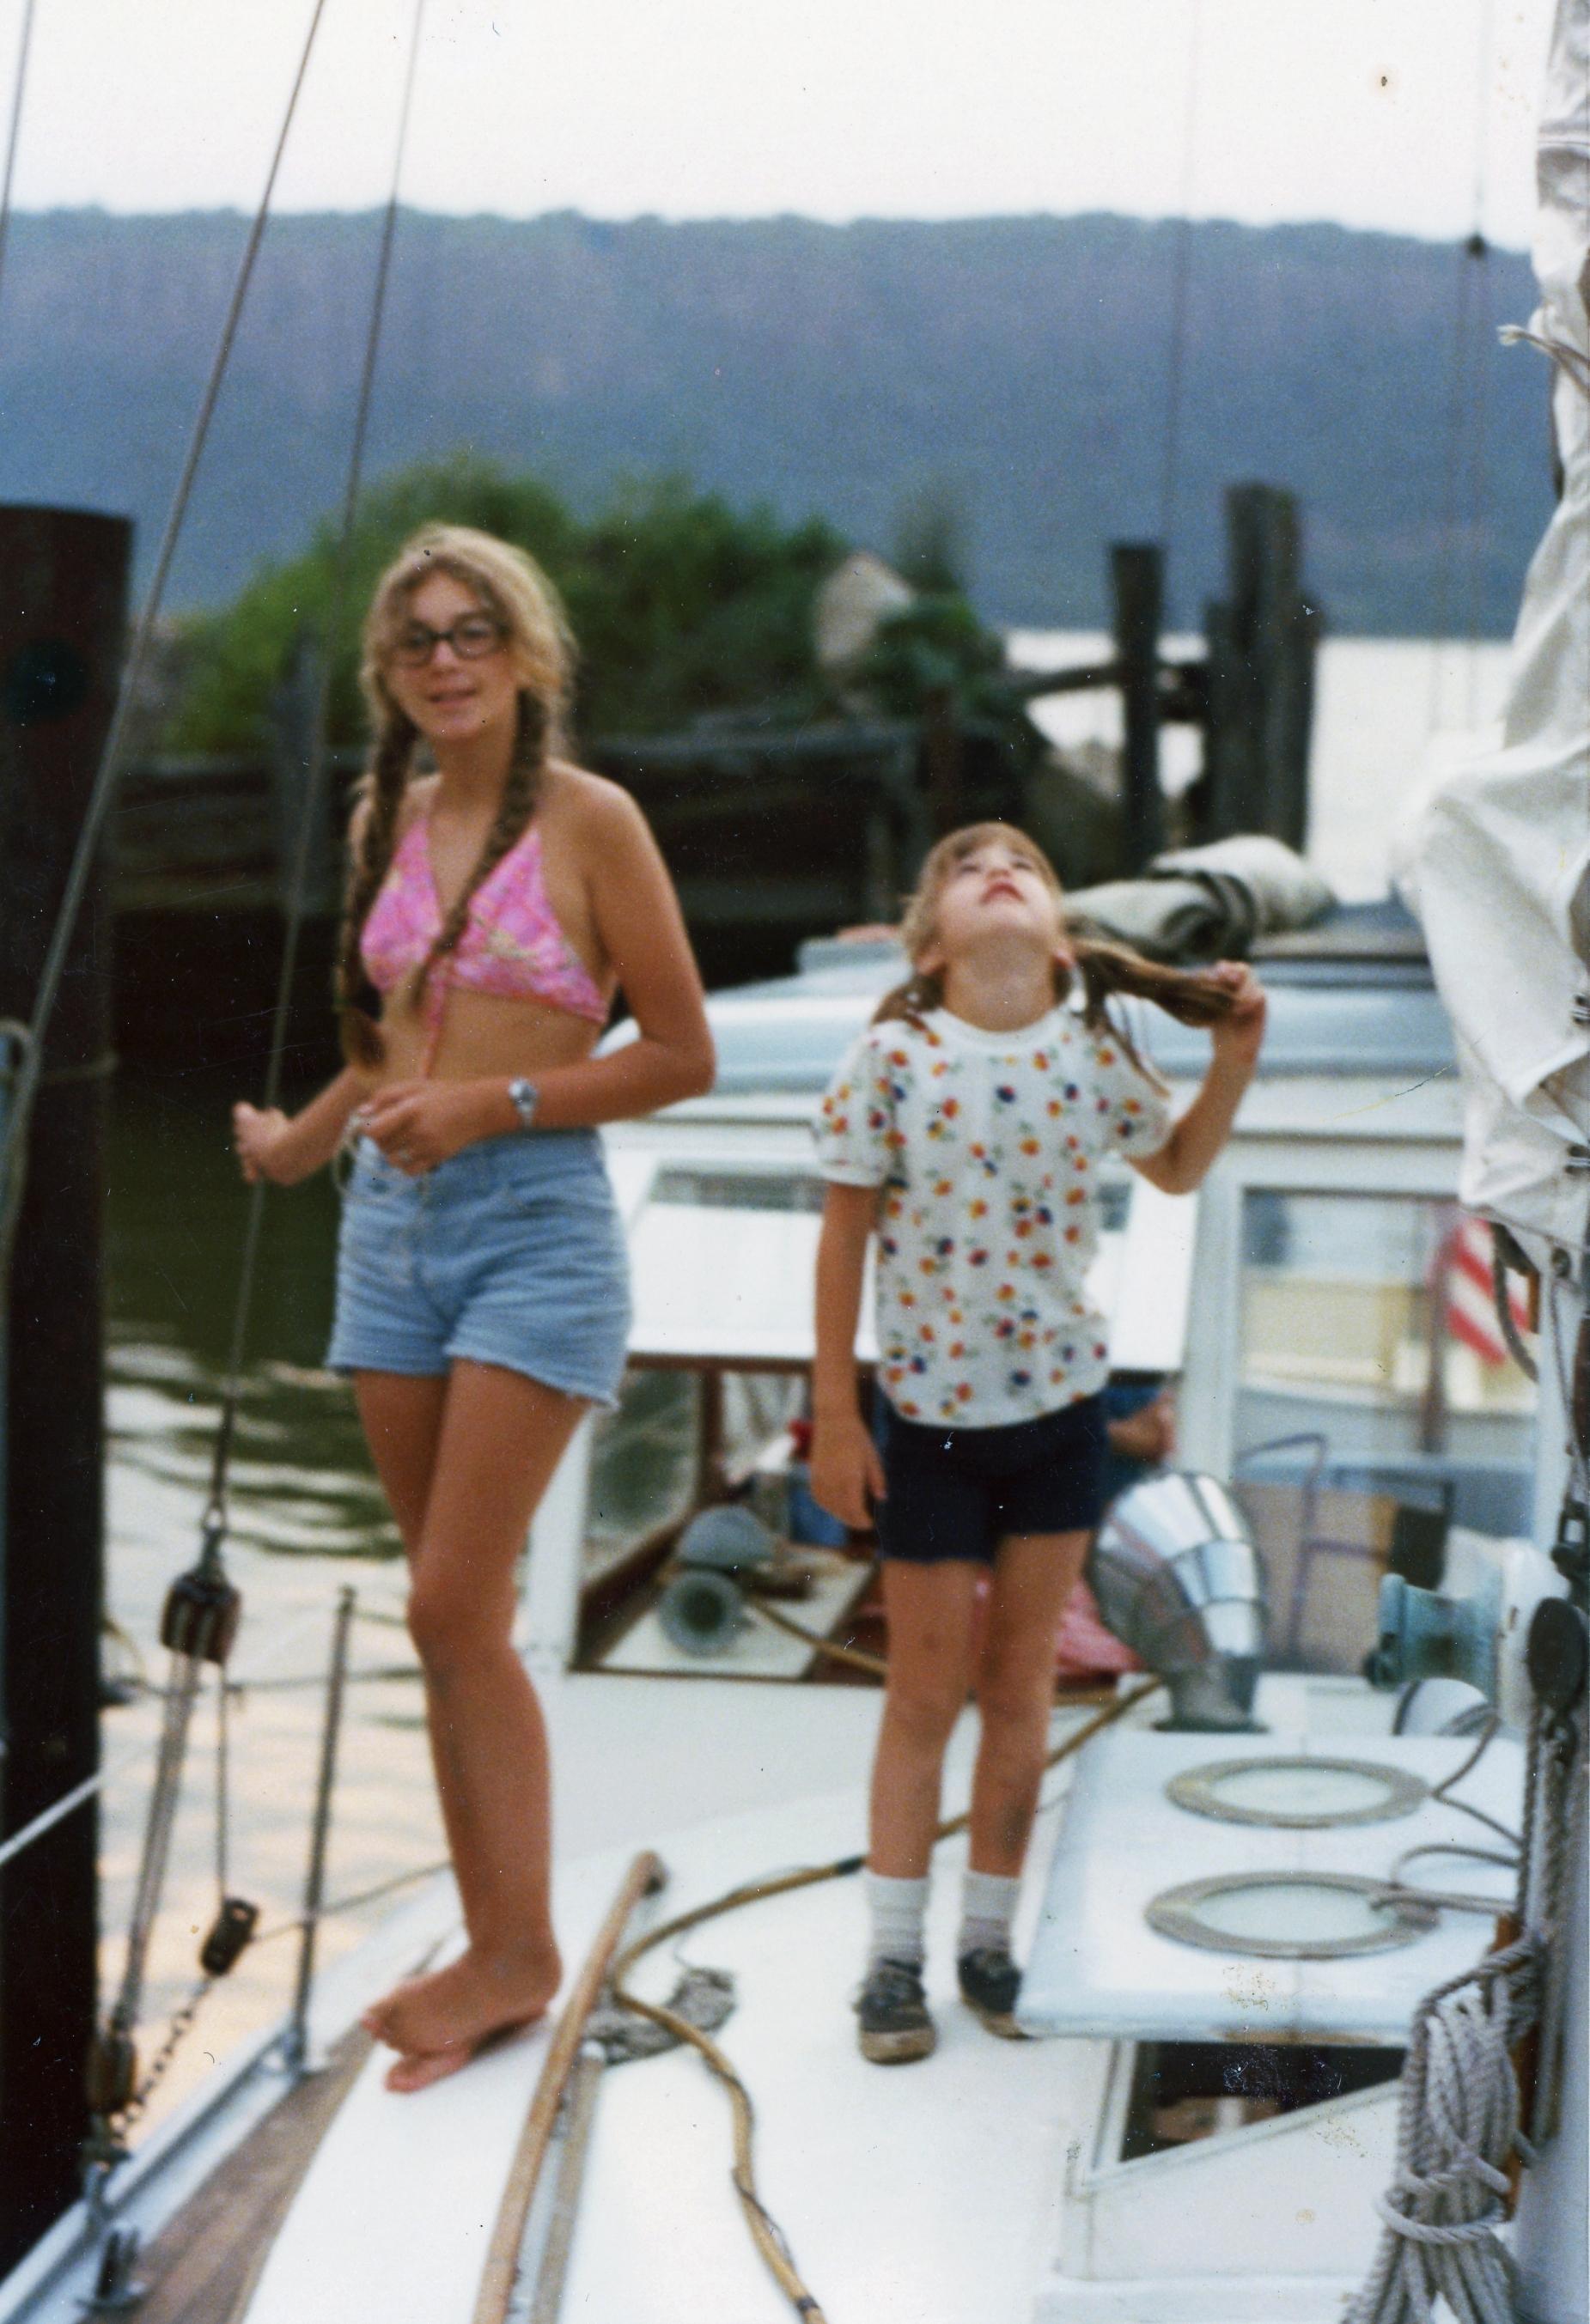 Boat_Trip_030.JPG